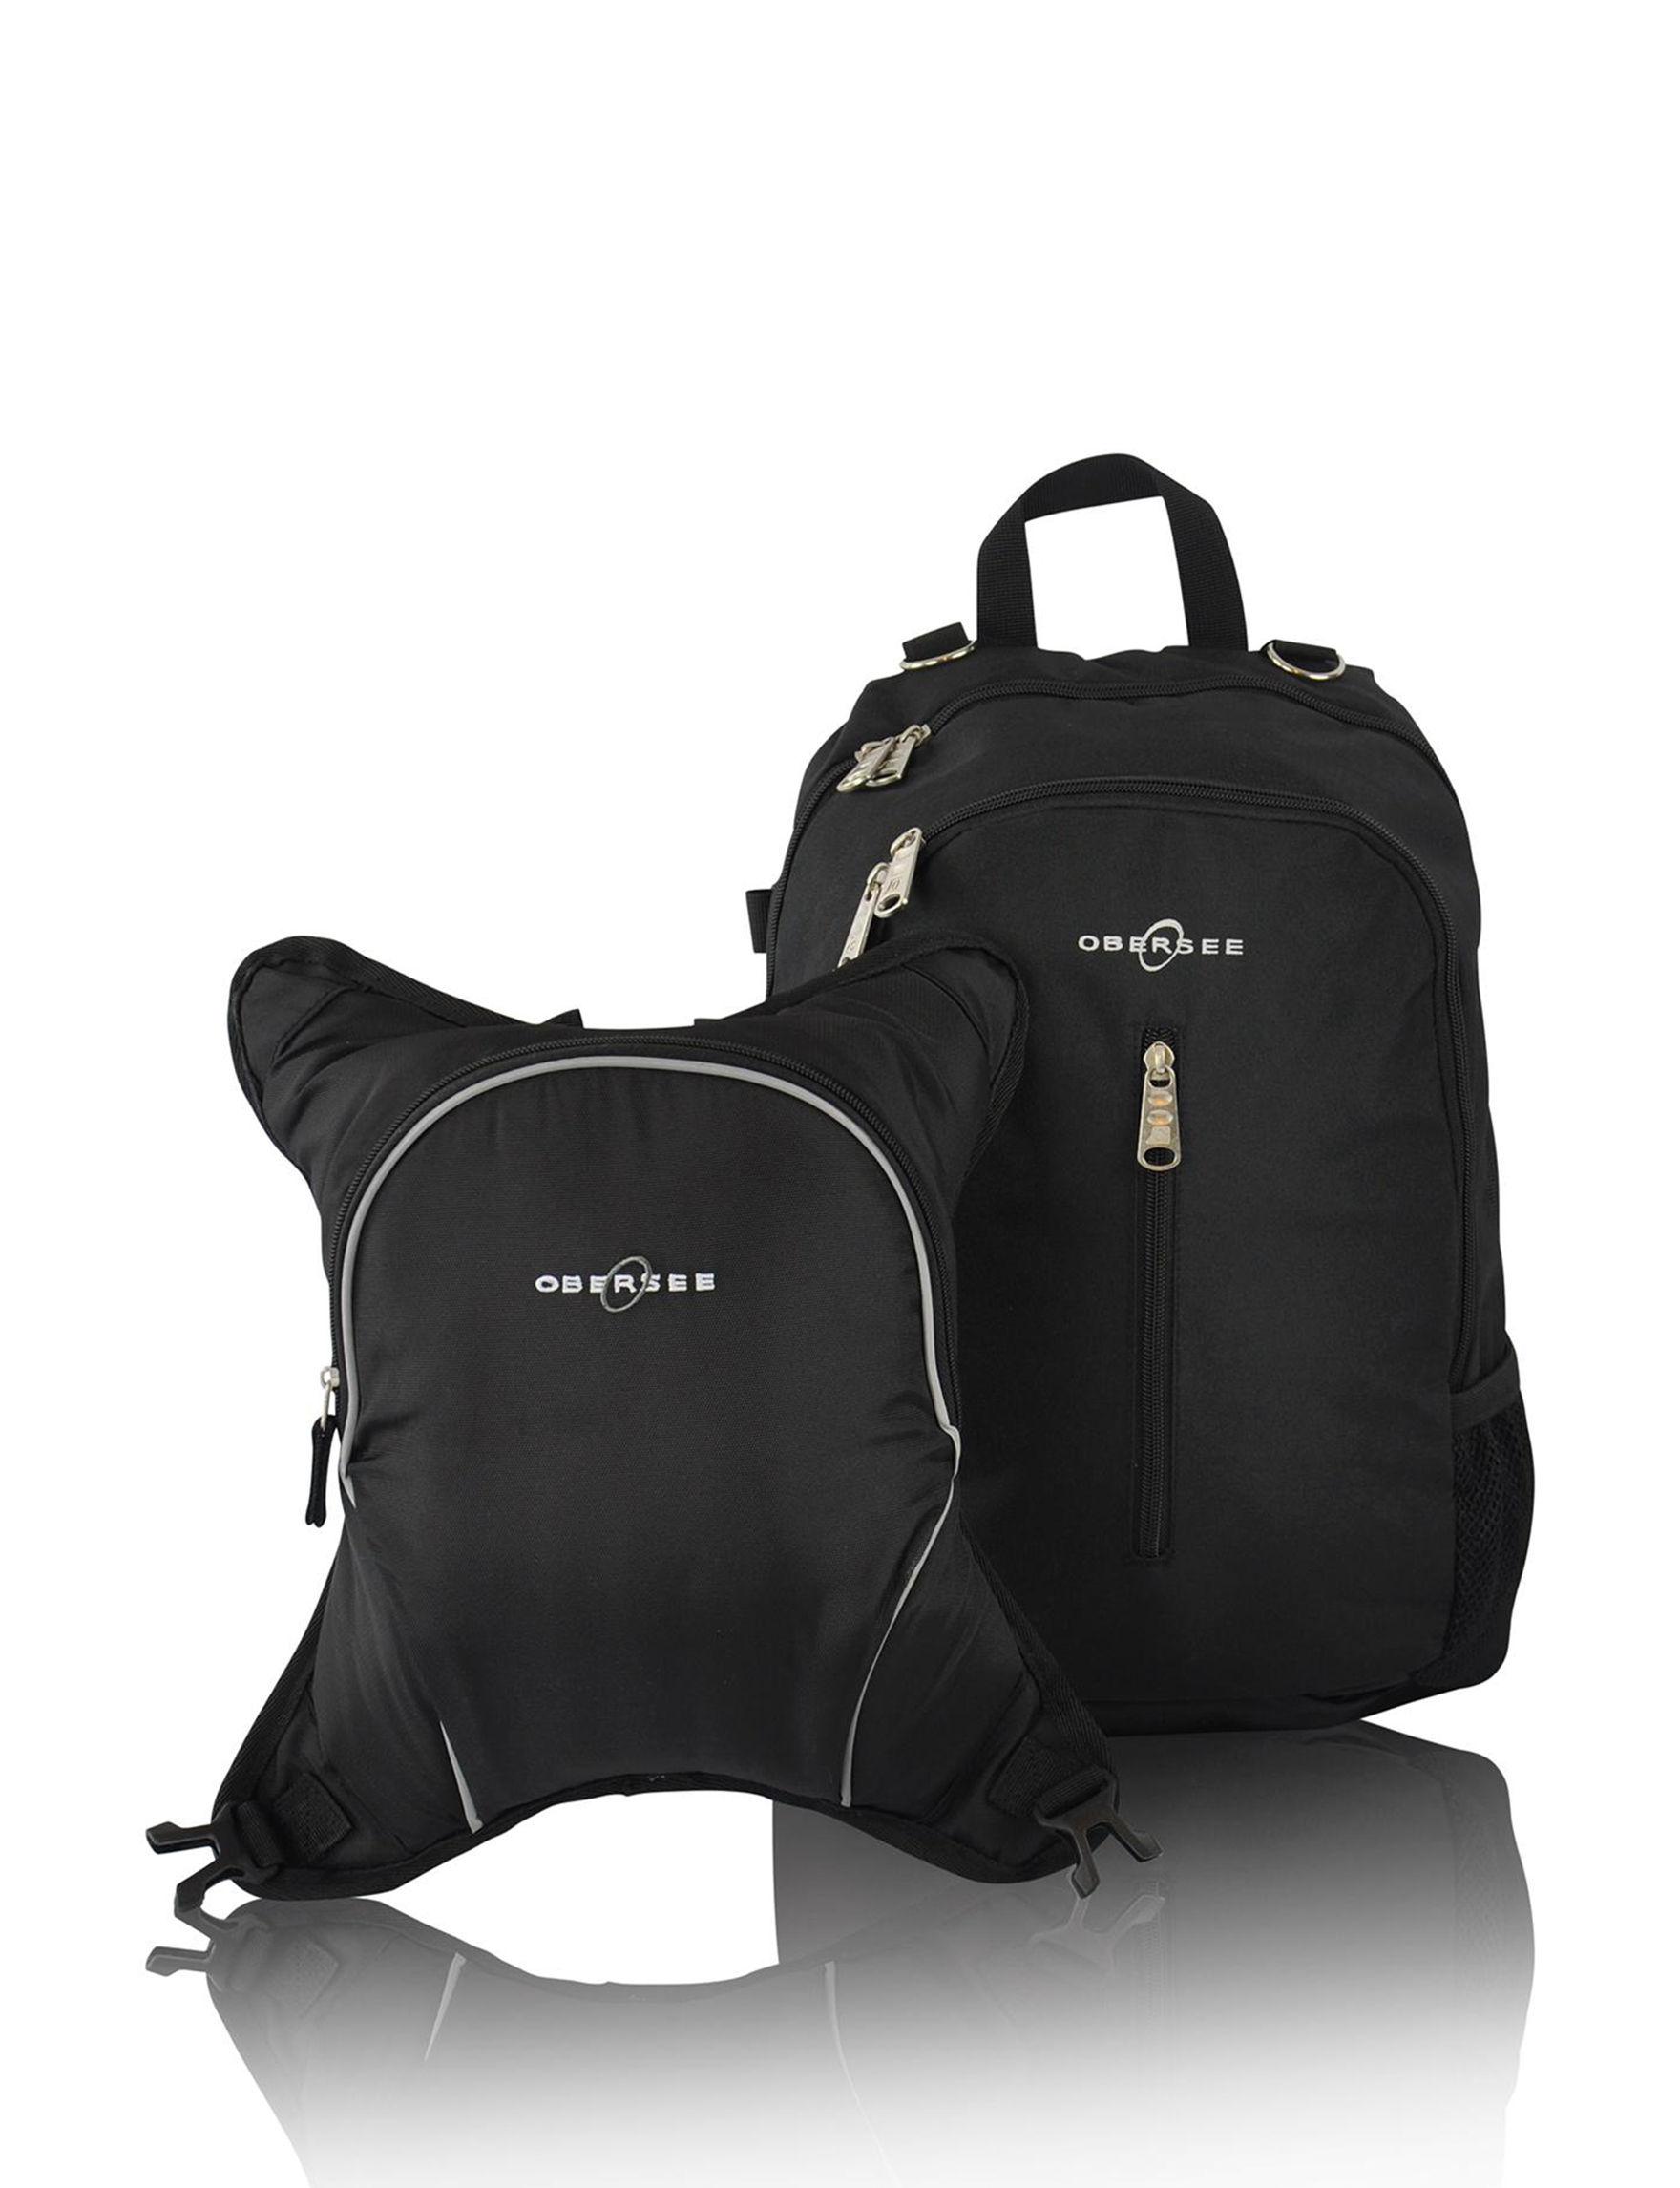 Obersee Black / Black Bookbags & Backpacks Diaper Bags